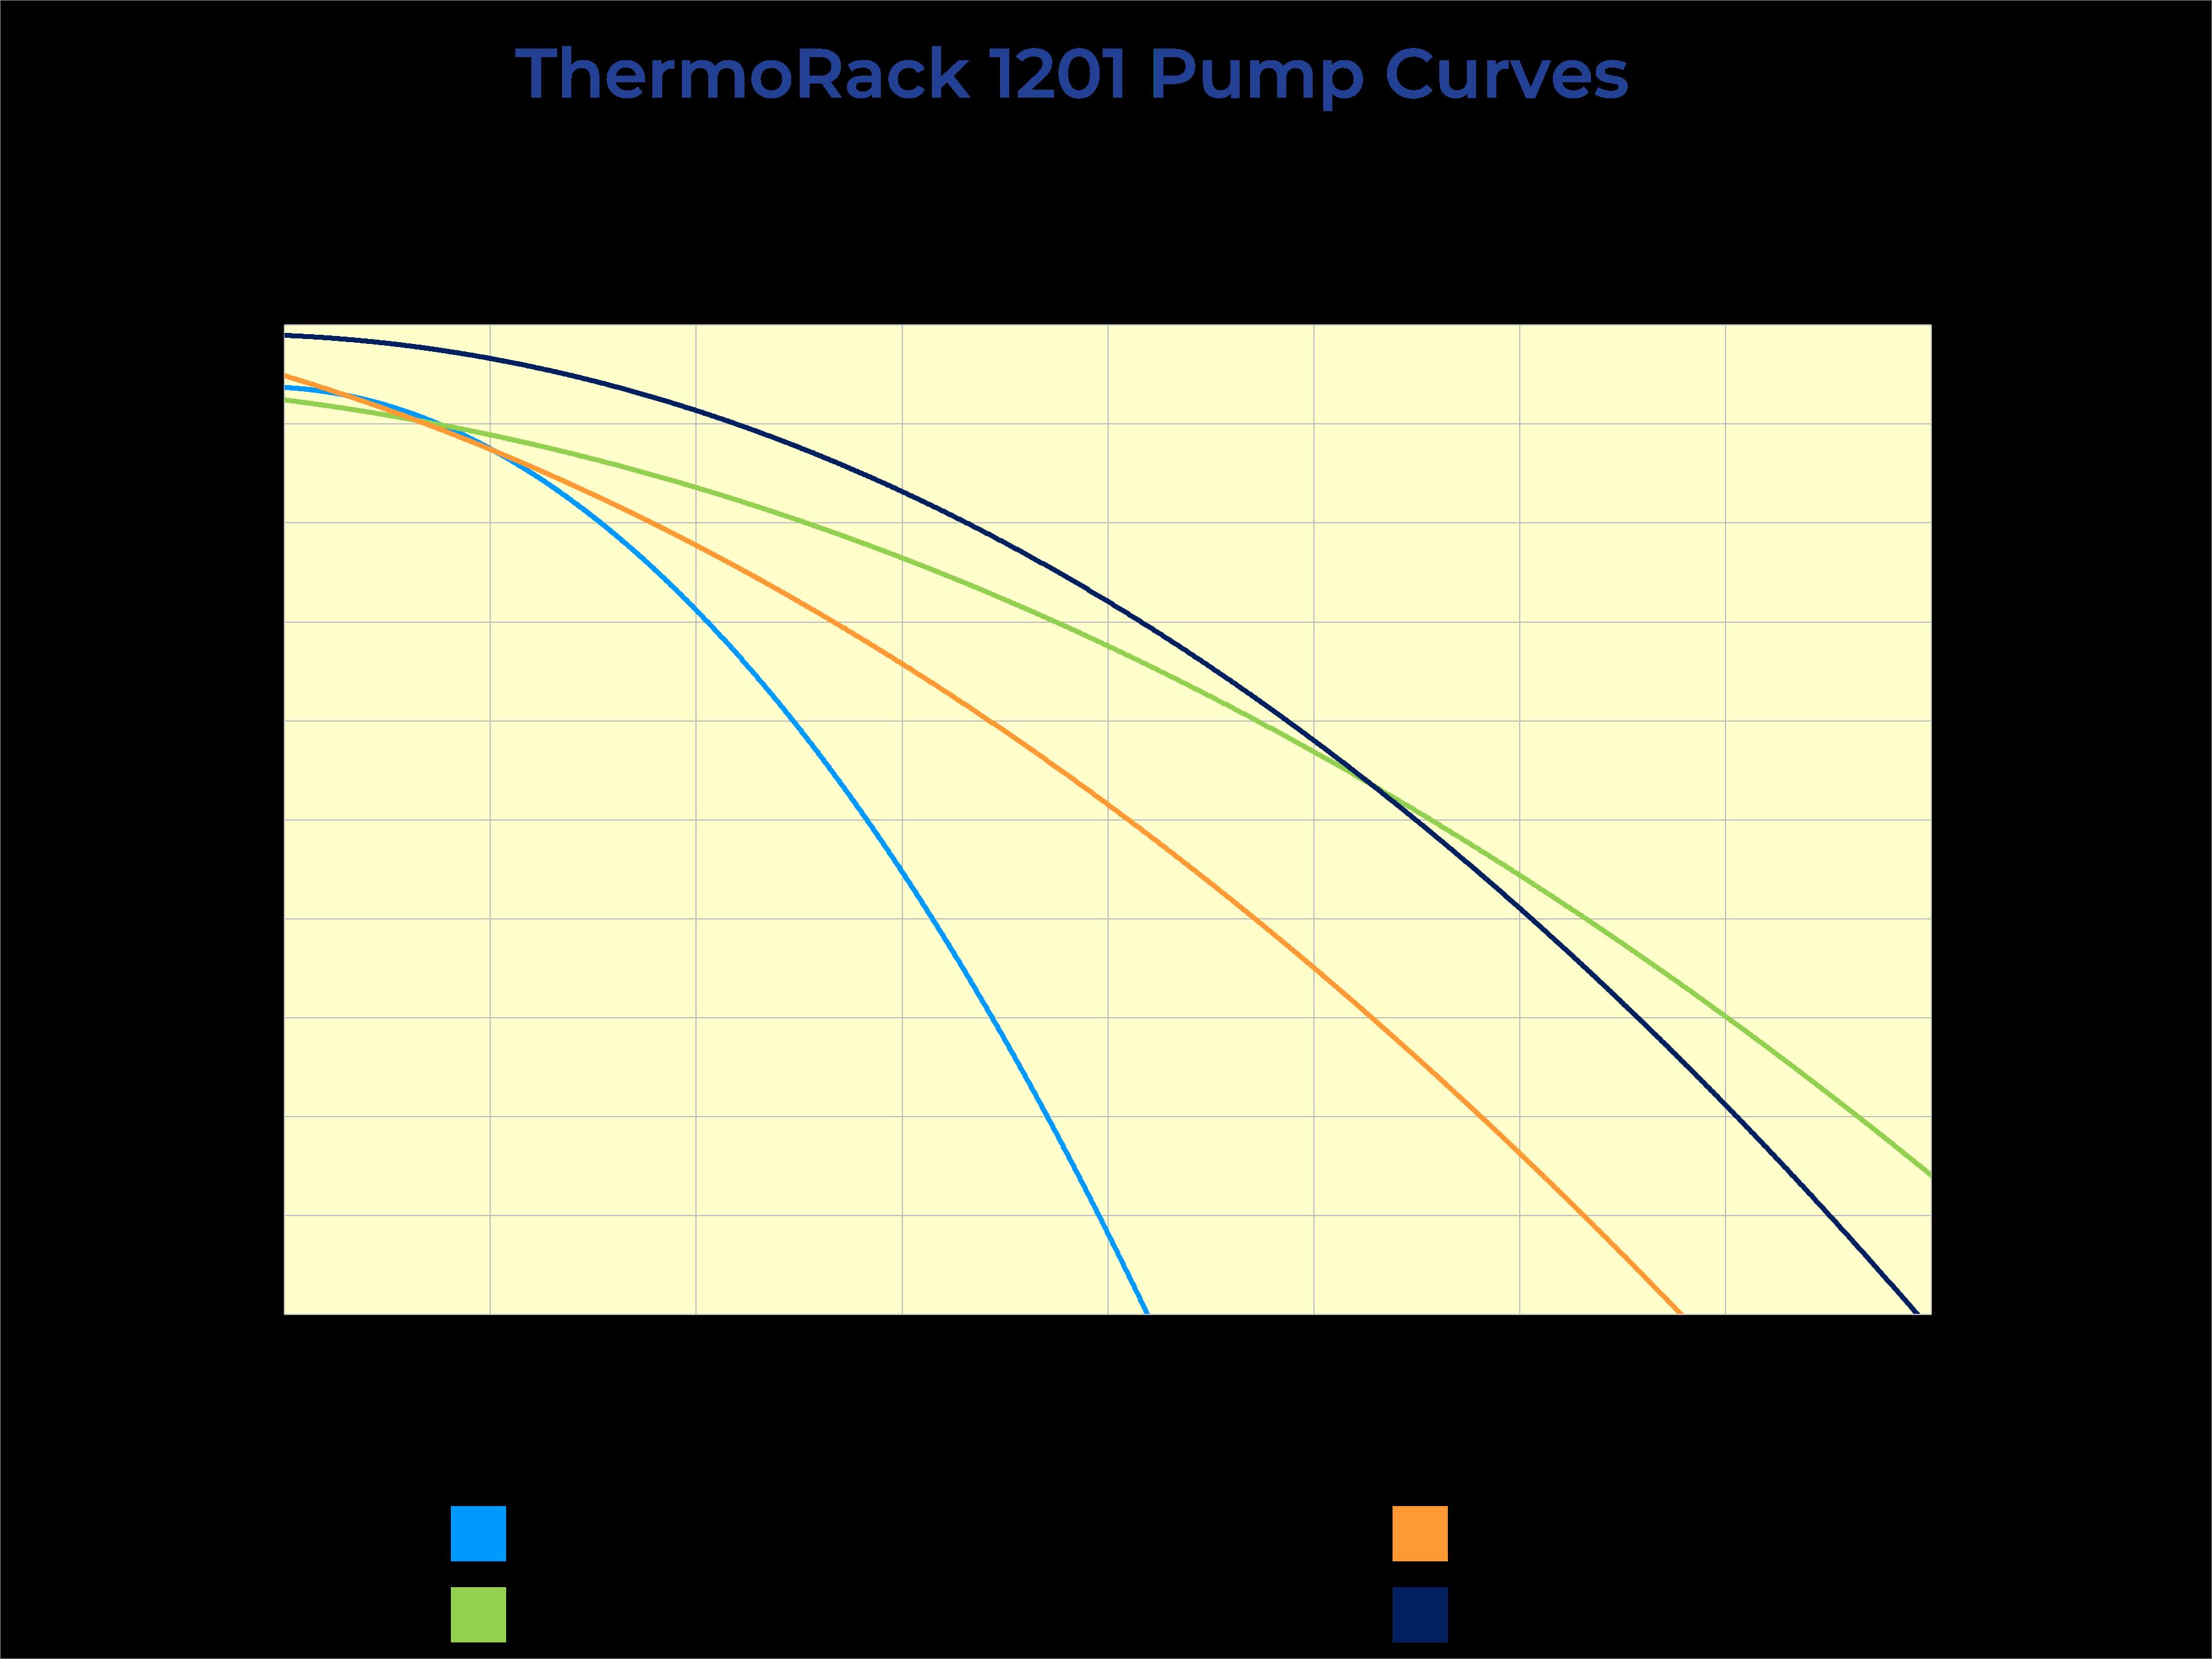 ThermoRack 1201 Pump Curves